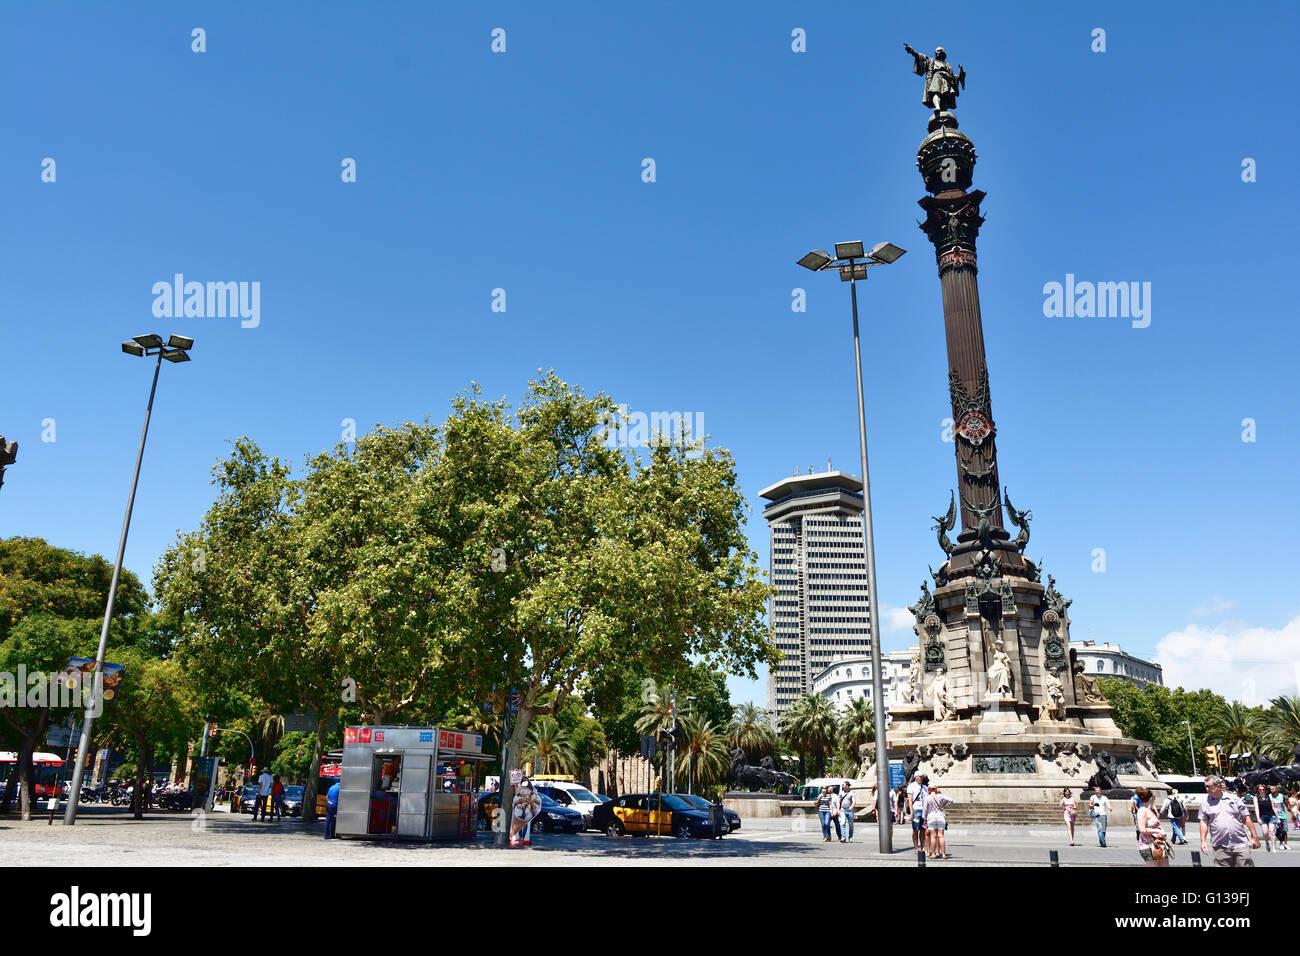 Columbus monument. Barcelona, Catalonia, Spain, Europe - Stock Image